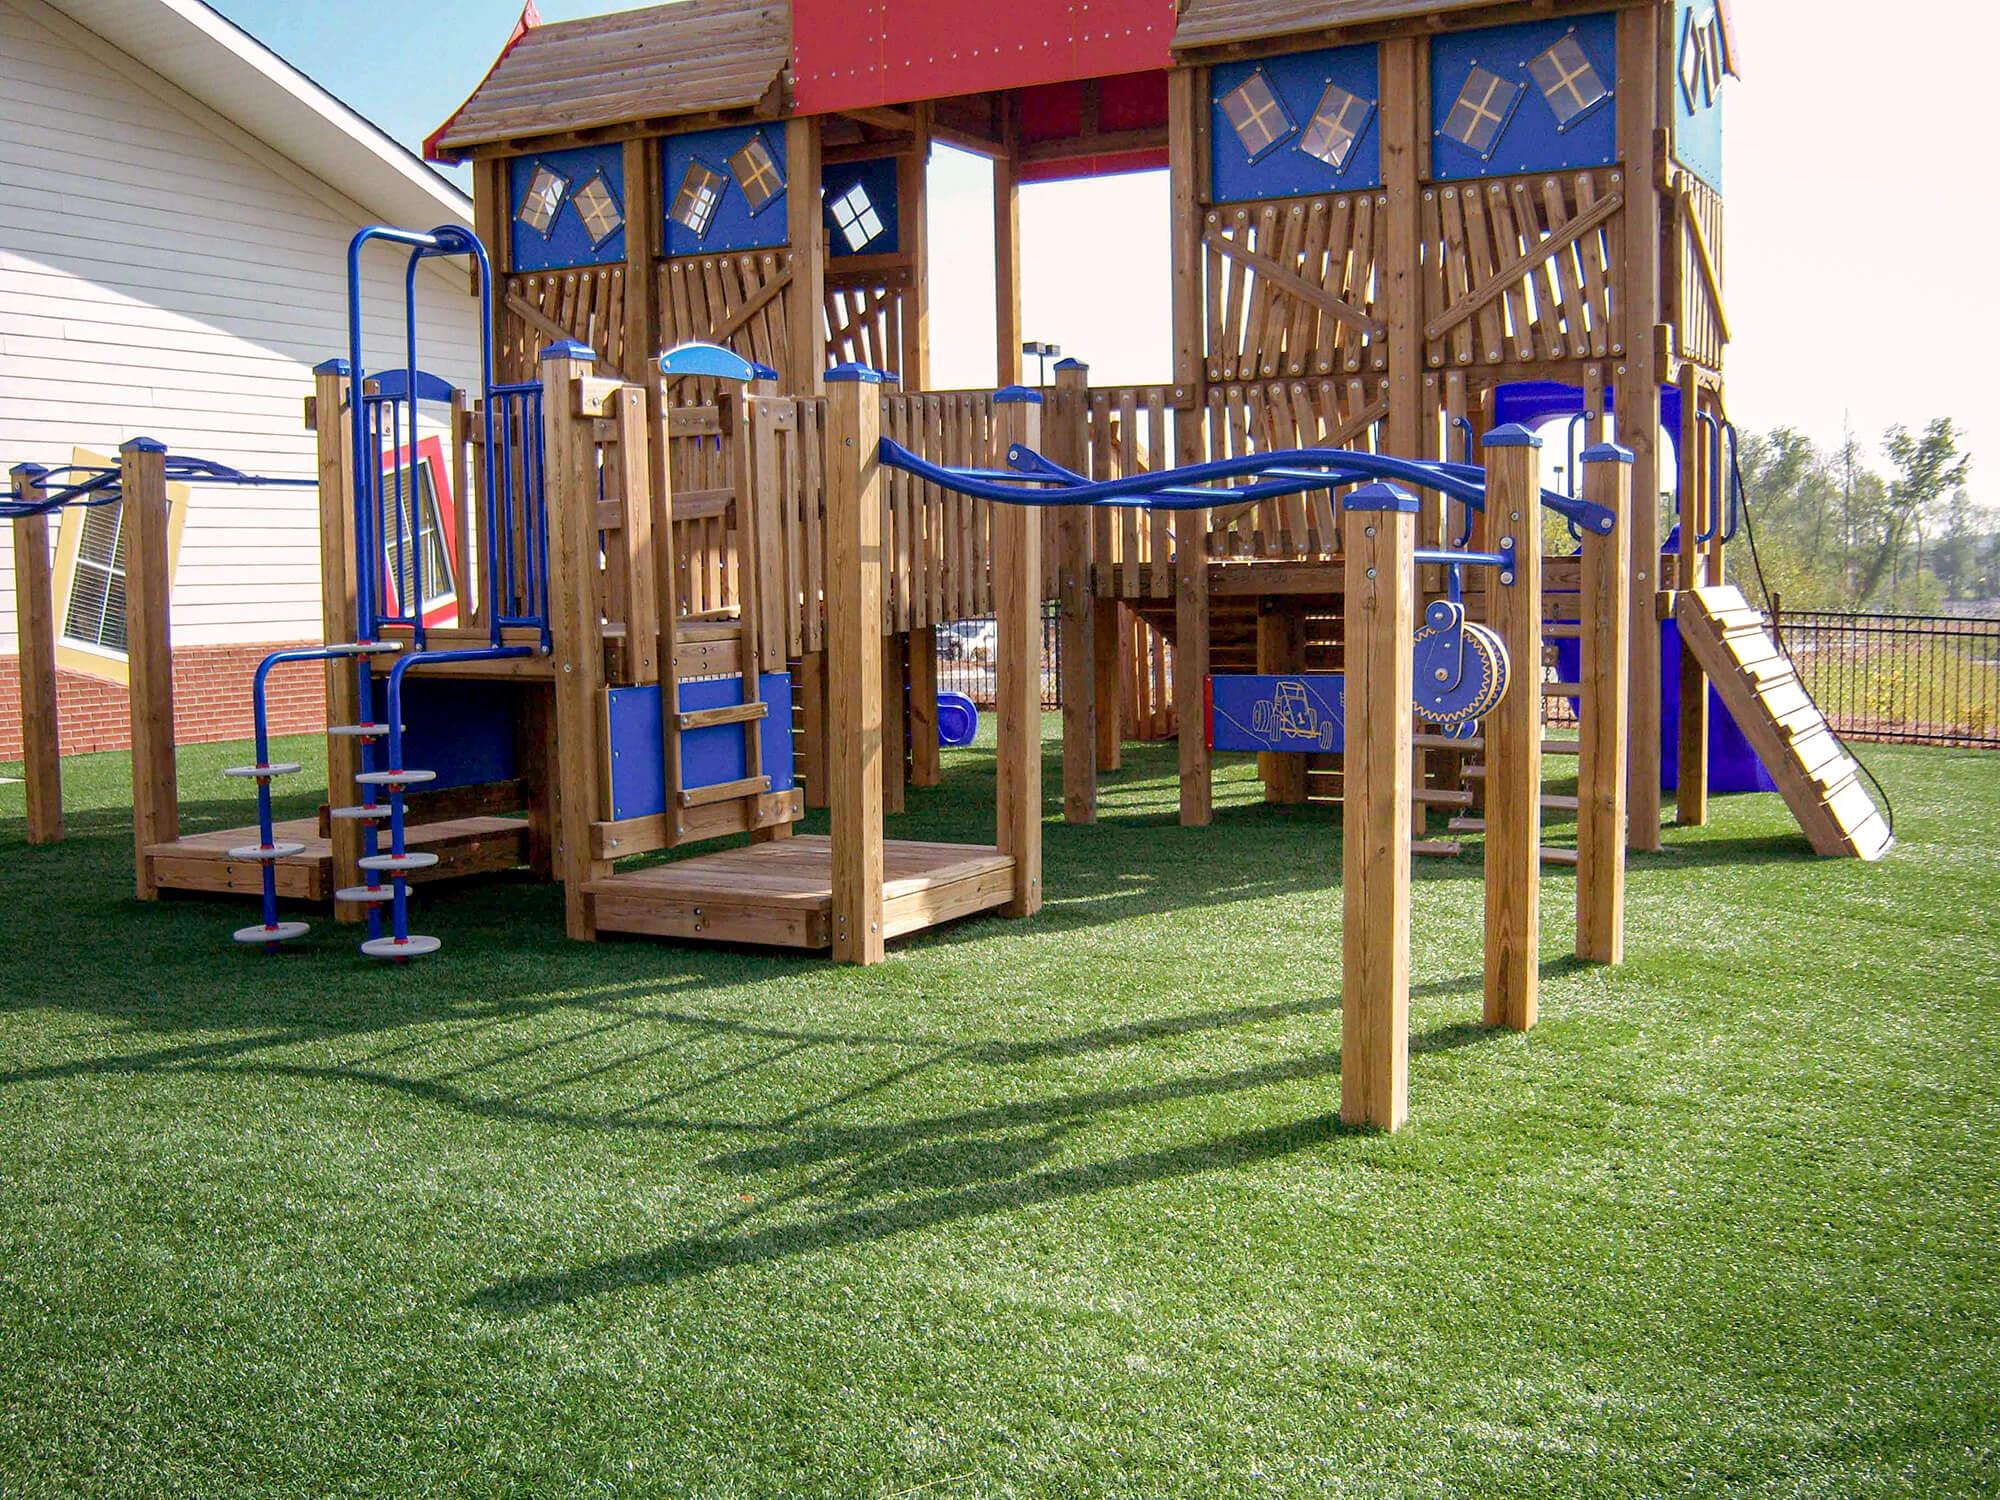 Kids playground jungle gym on turf